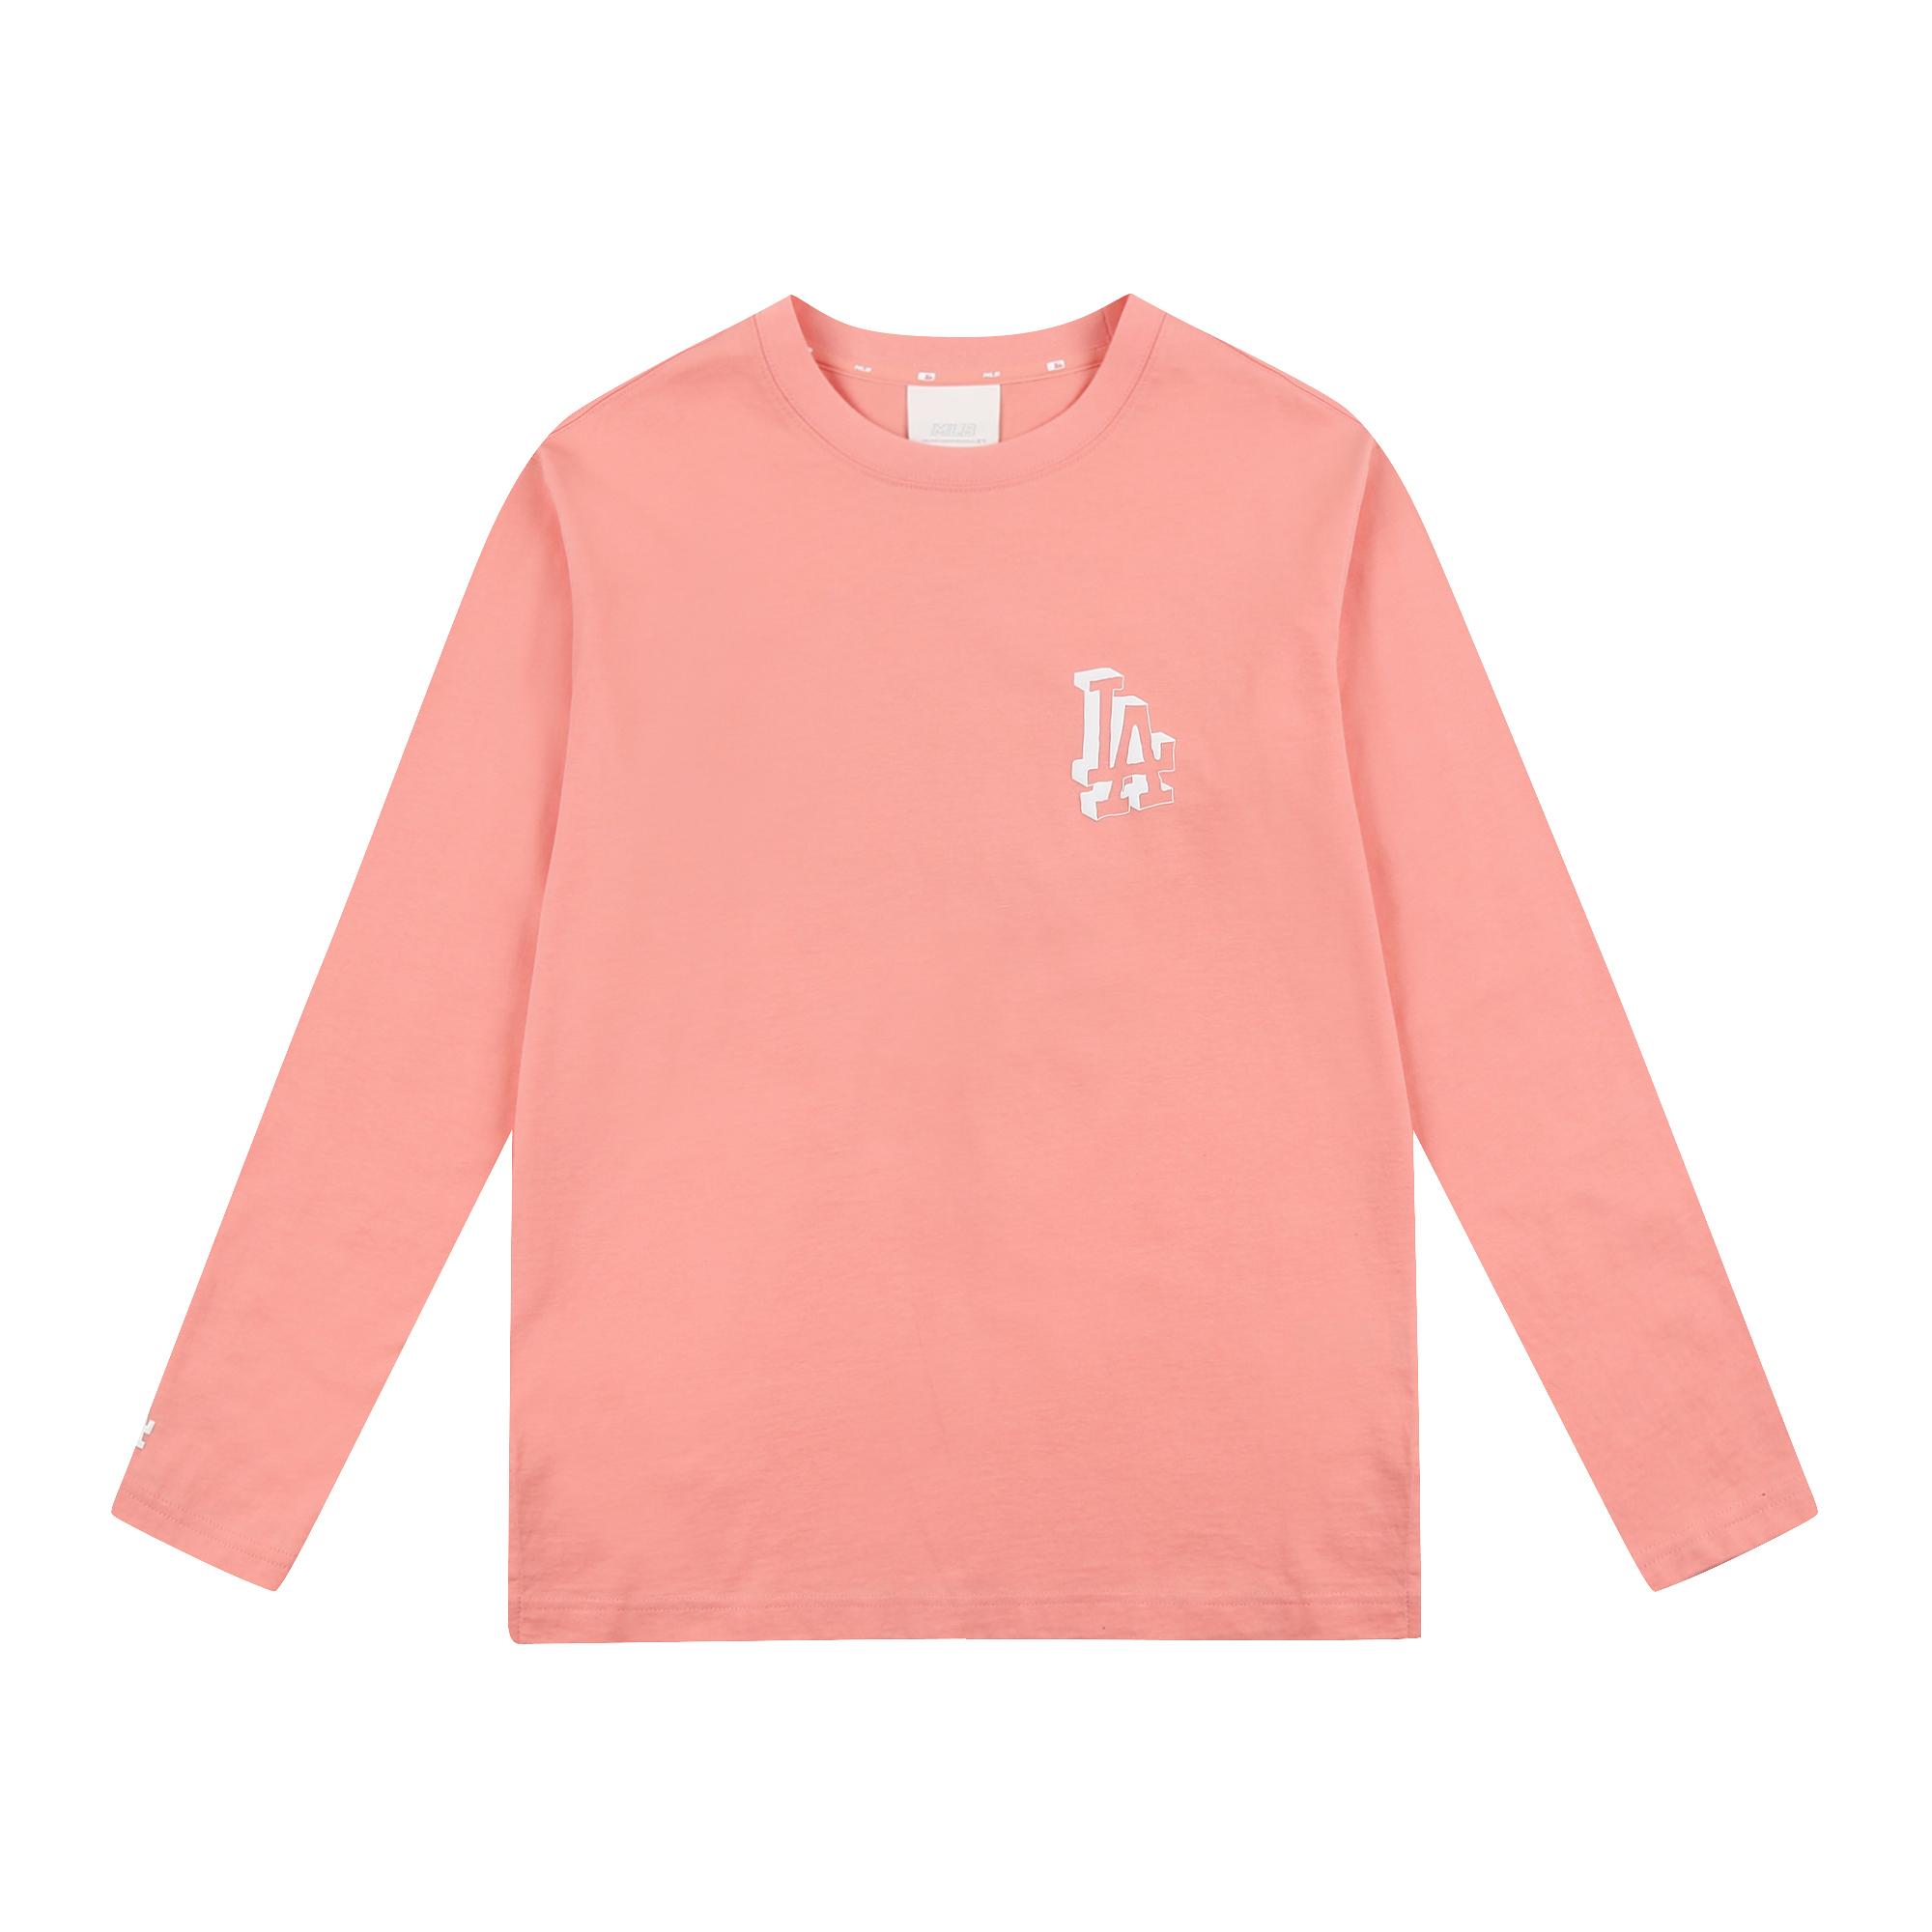 LIKE 단색 팝콘 긴팔 티셔츠 LA다저스